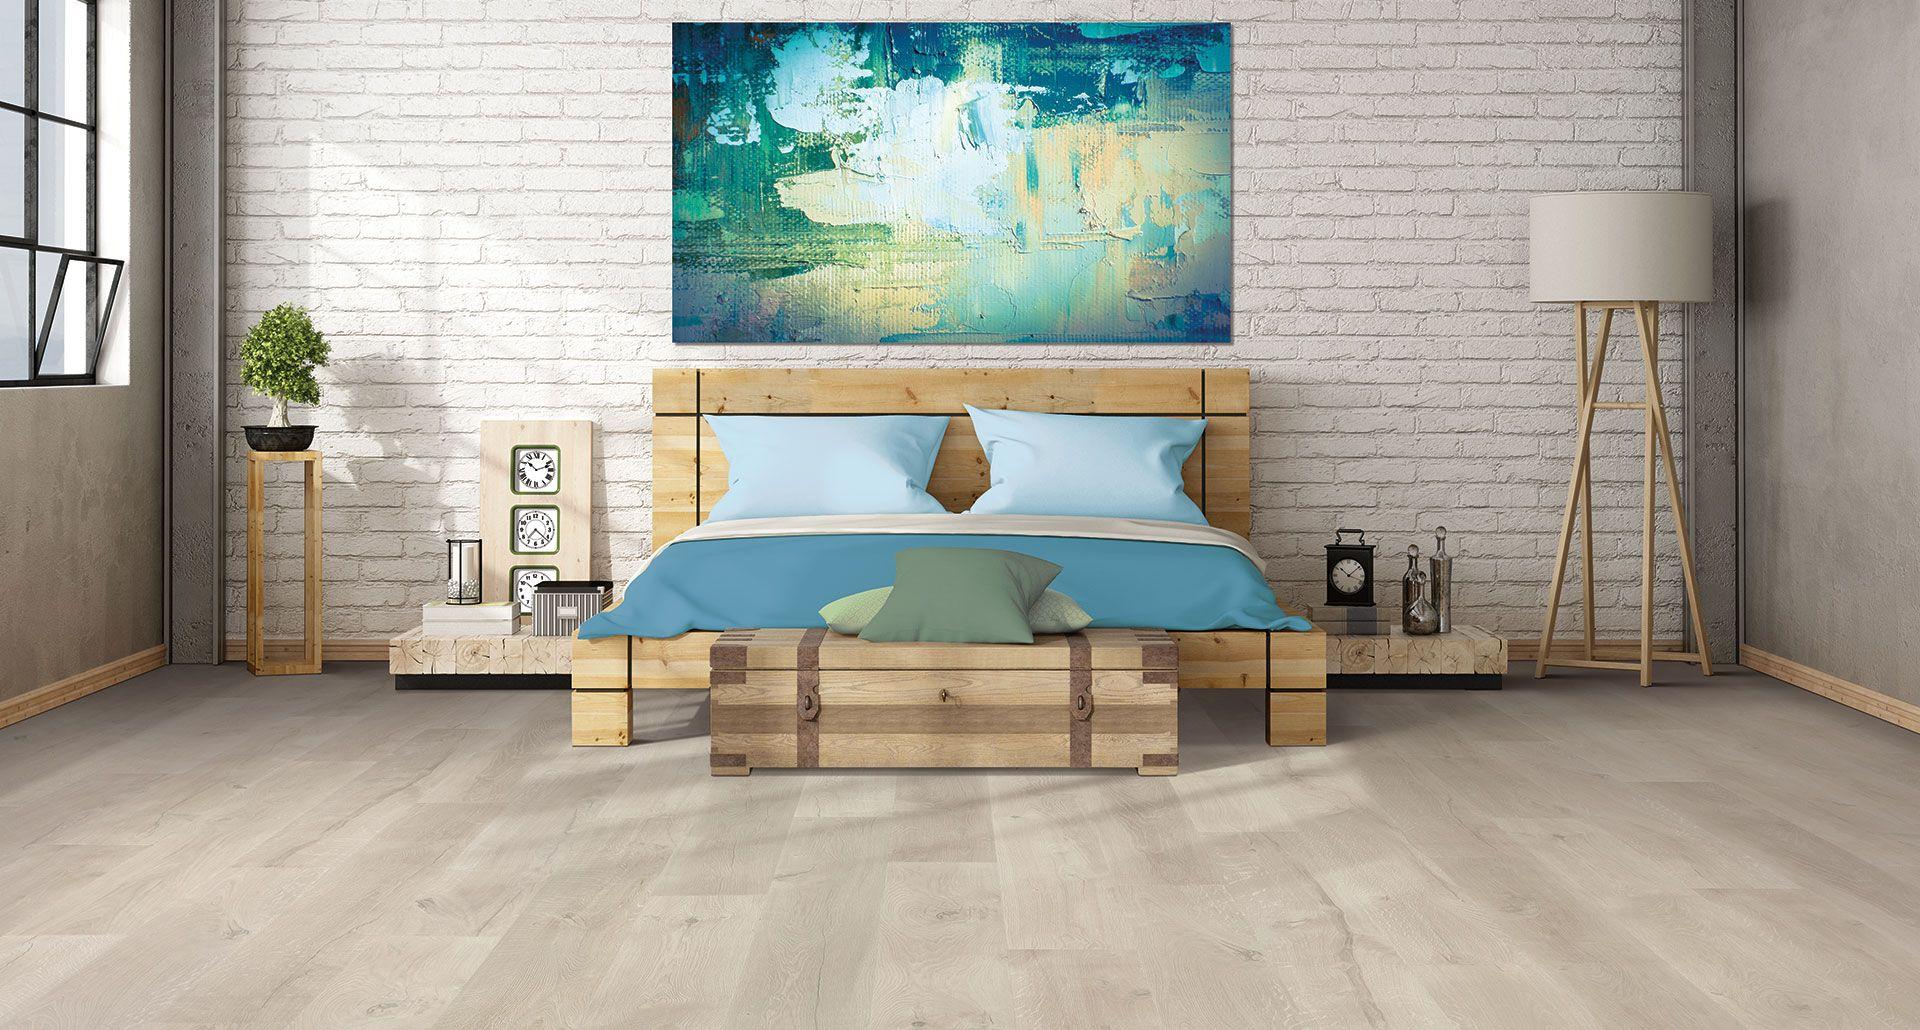 Ocean View Oak Pergo Timbercraft Wetprotect Laminate Flooring Waterproof Laminate Flooring Pergo Laminate Flooring Laminate Flooring